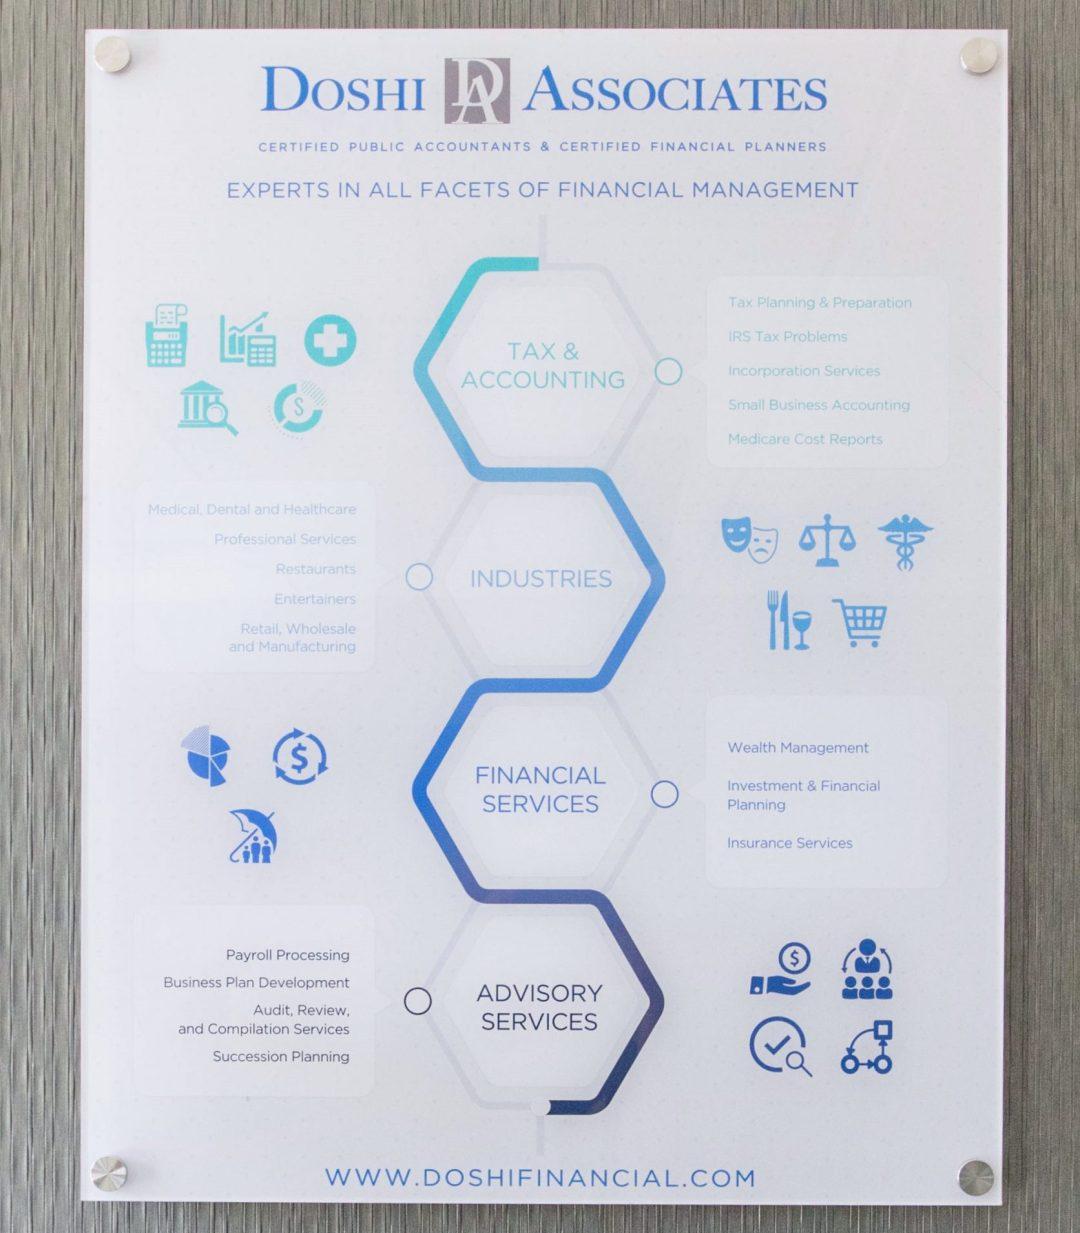 Doshi Infographic